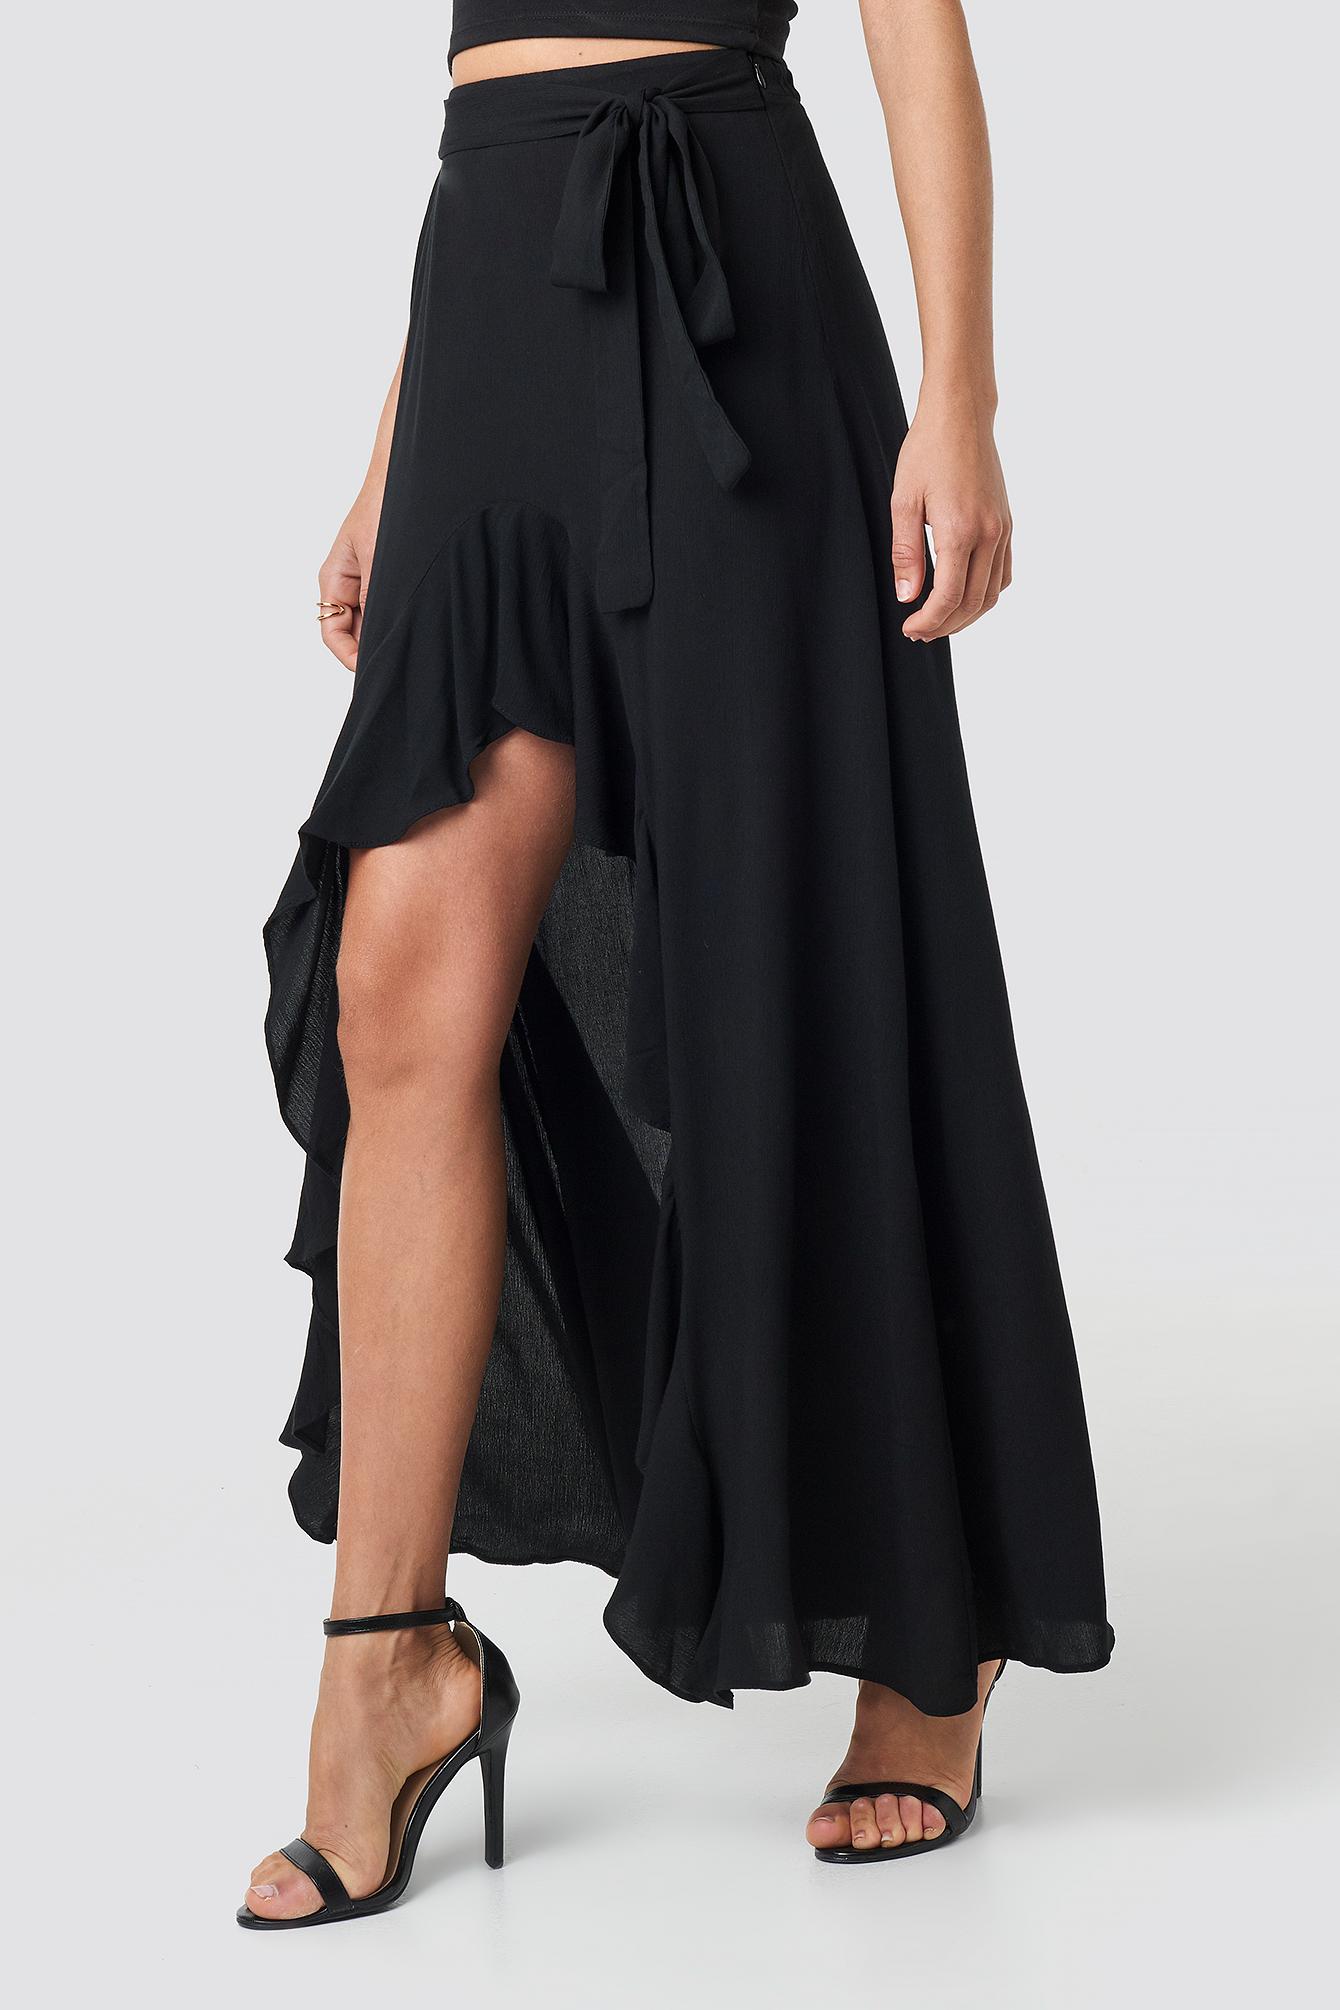 Ruffle Detail Maxi Skirt NA-KD.COM